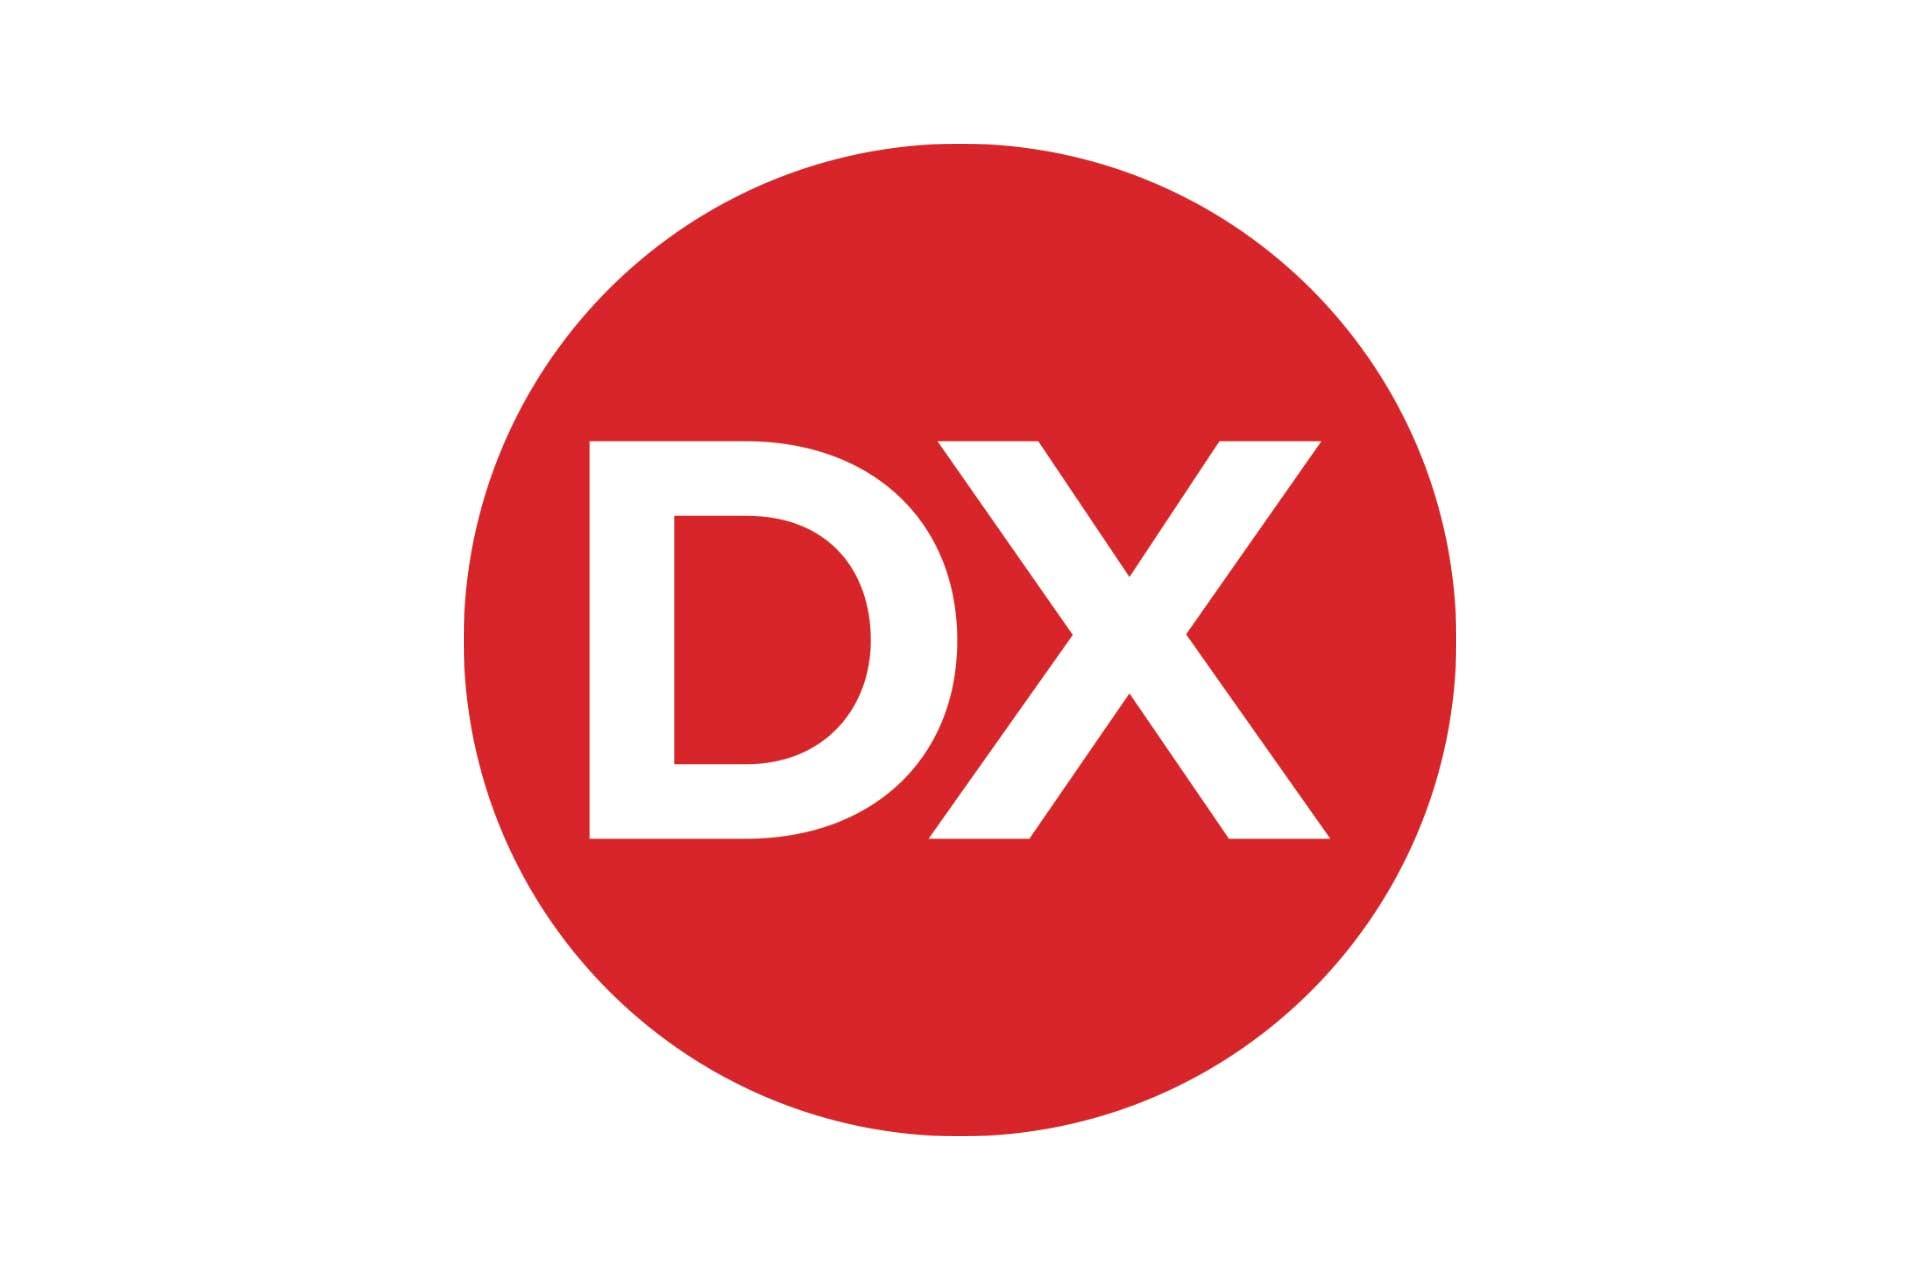 Delphi logosu